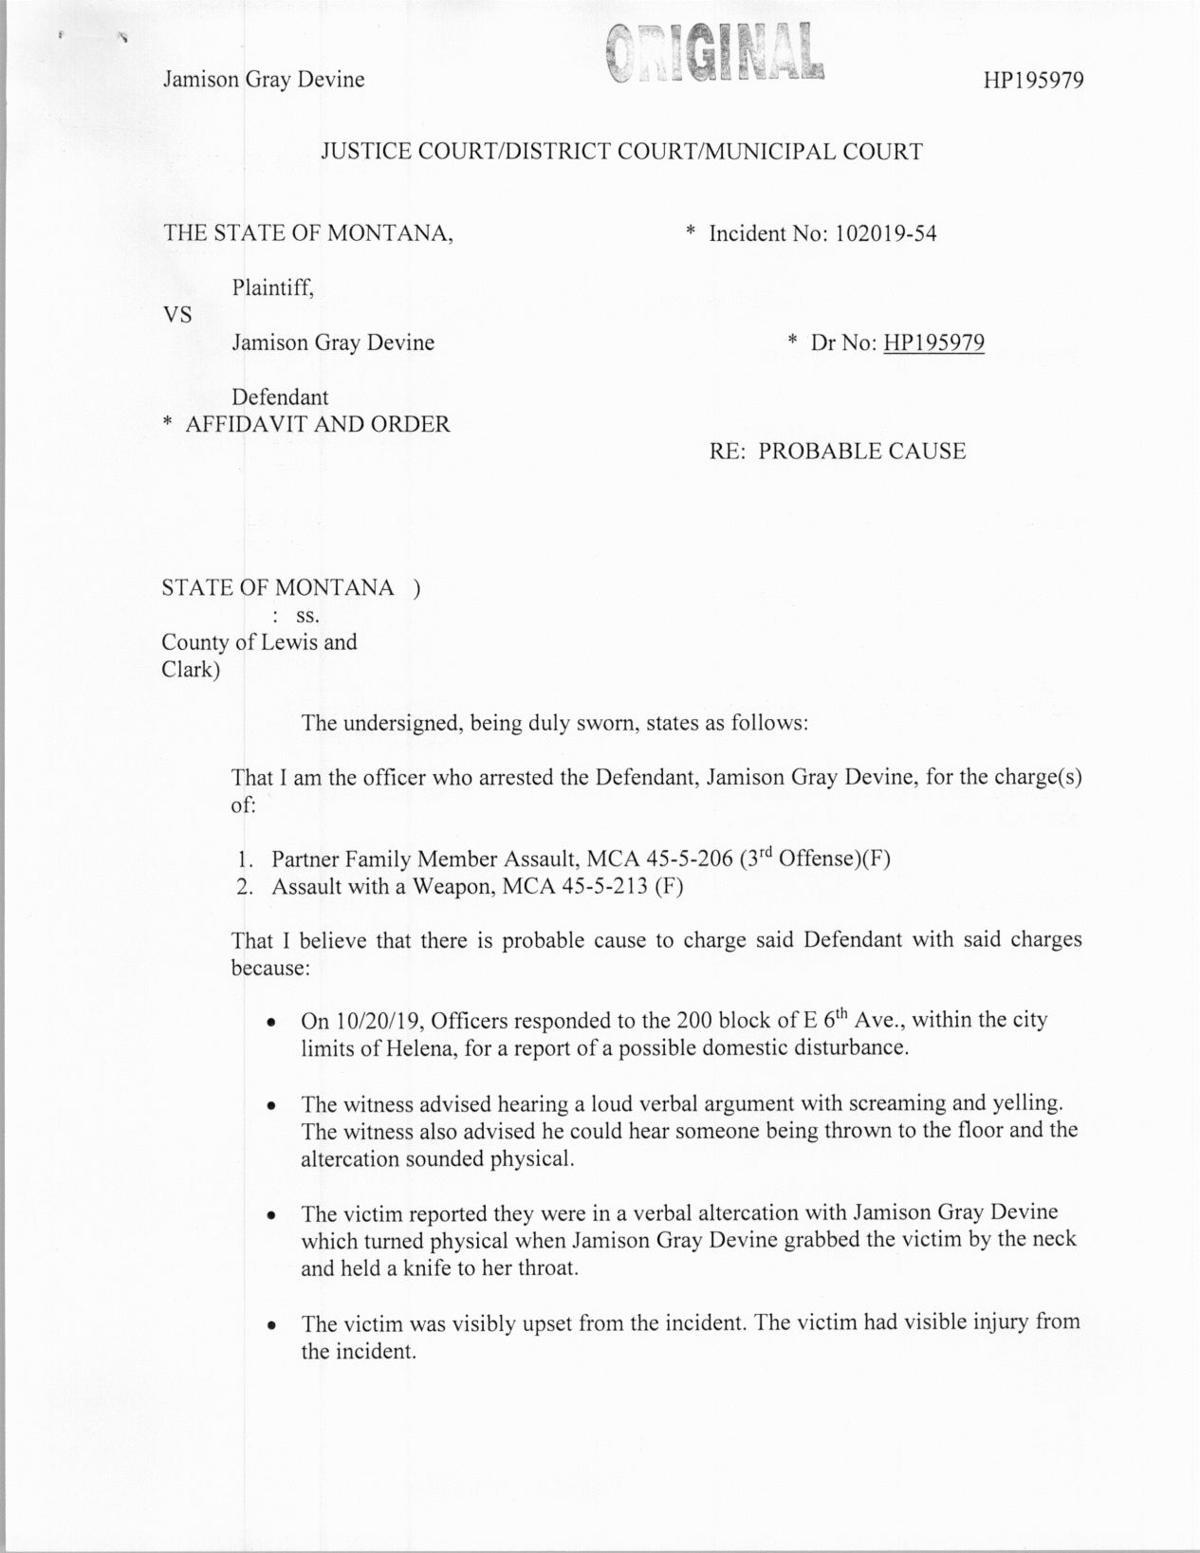 Affidavit for Jamison Devine